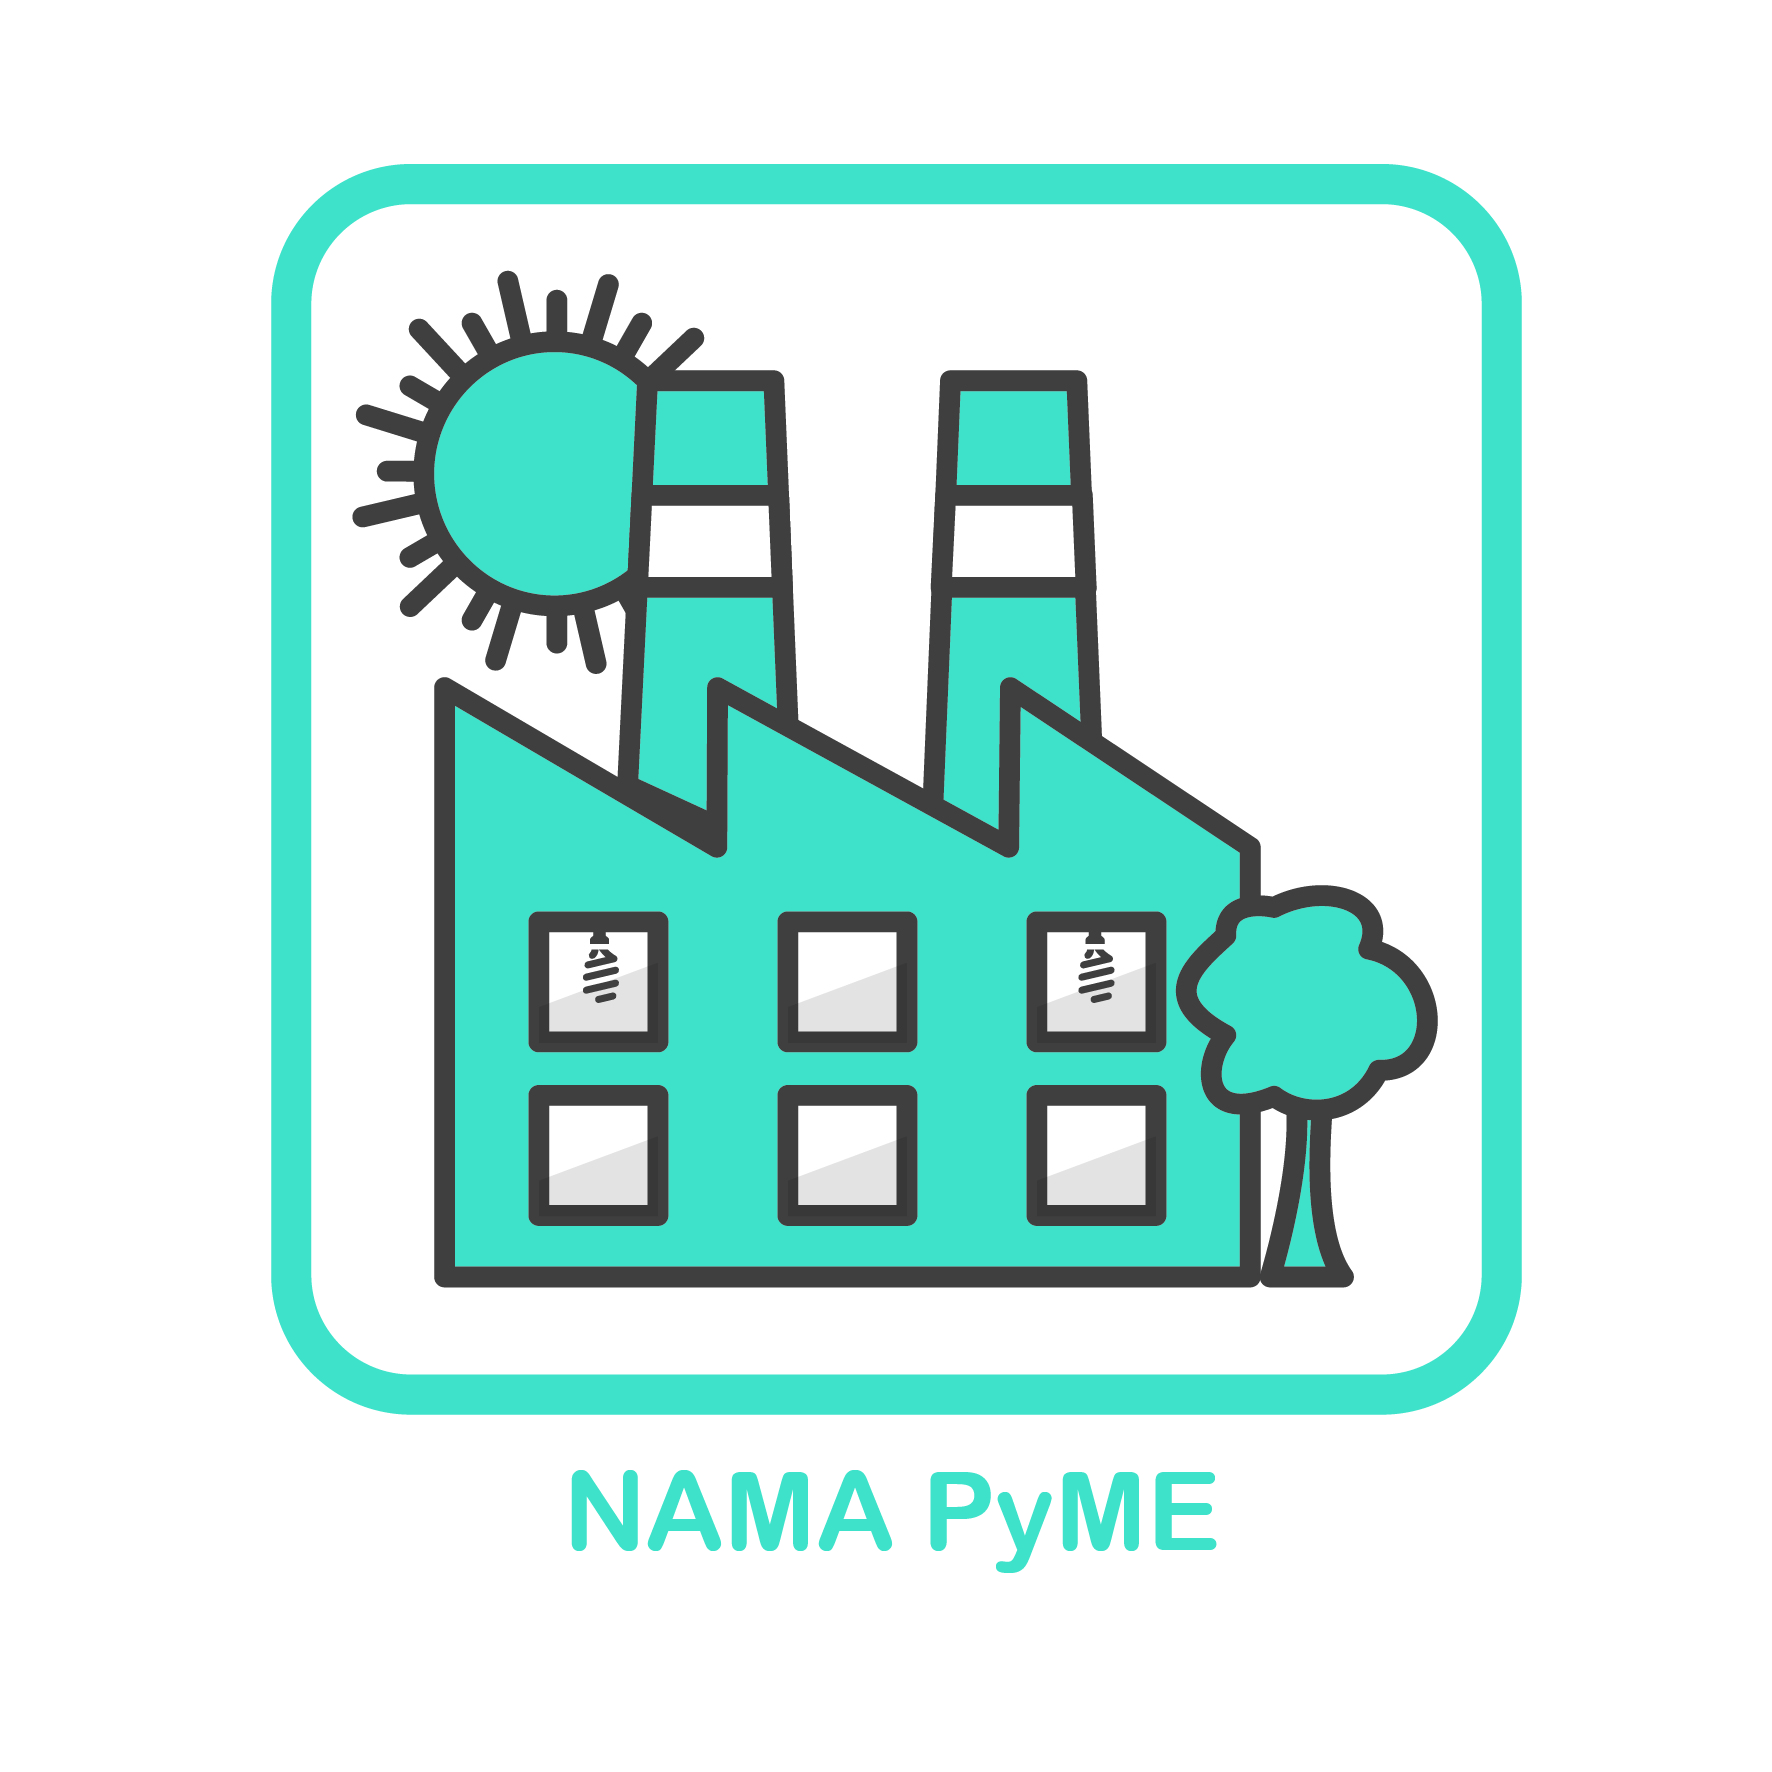 Icon of 04 NAMA PyME